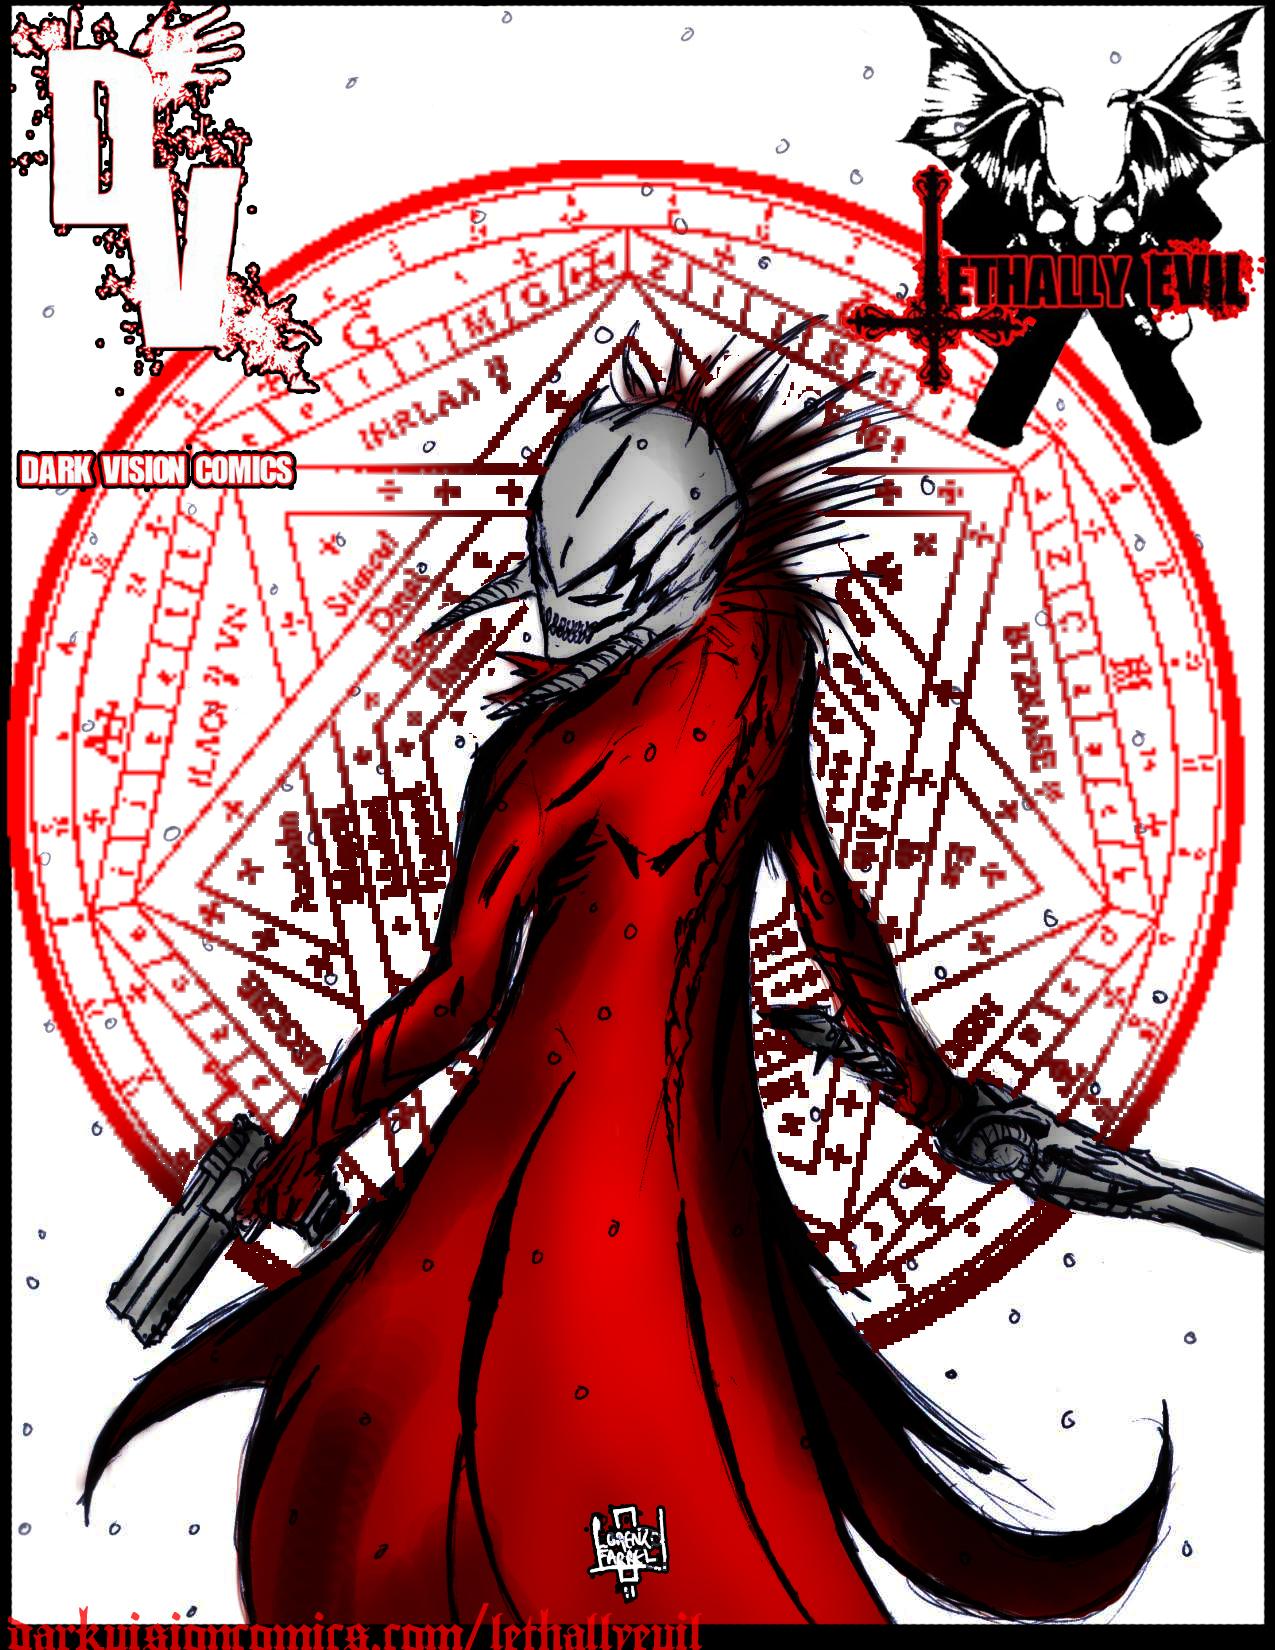 Lethally Evil 2